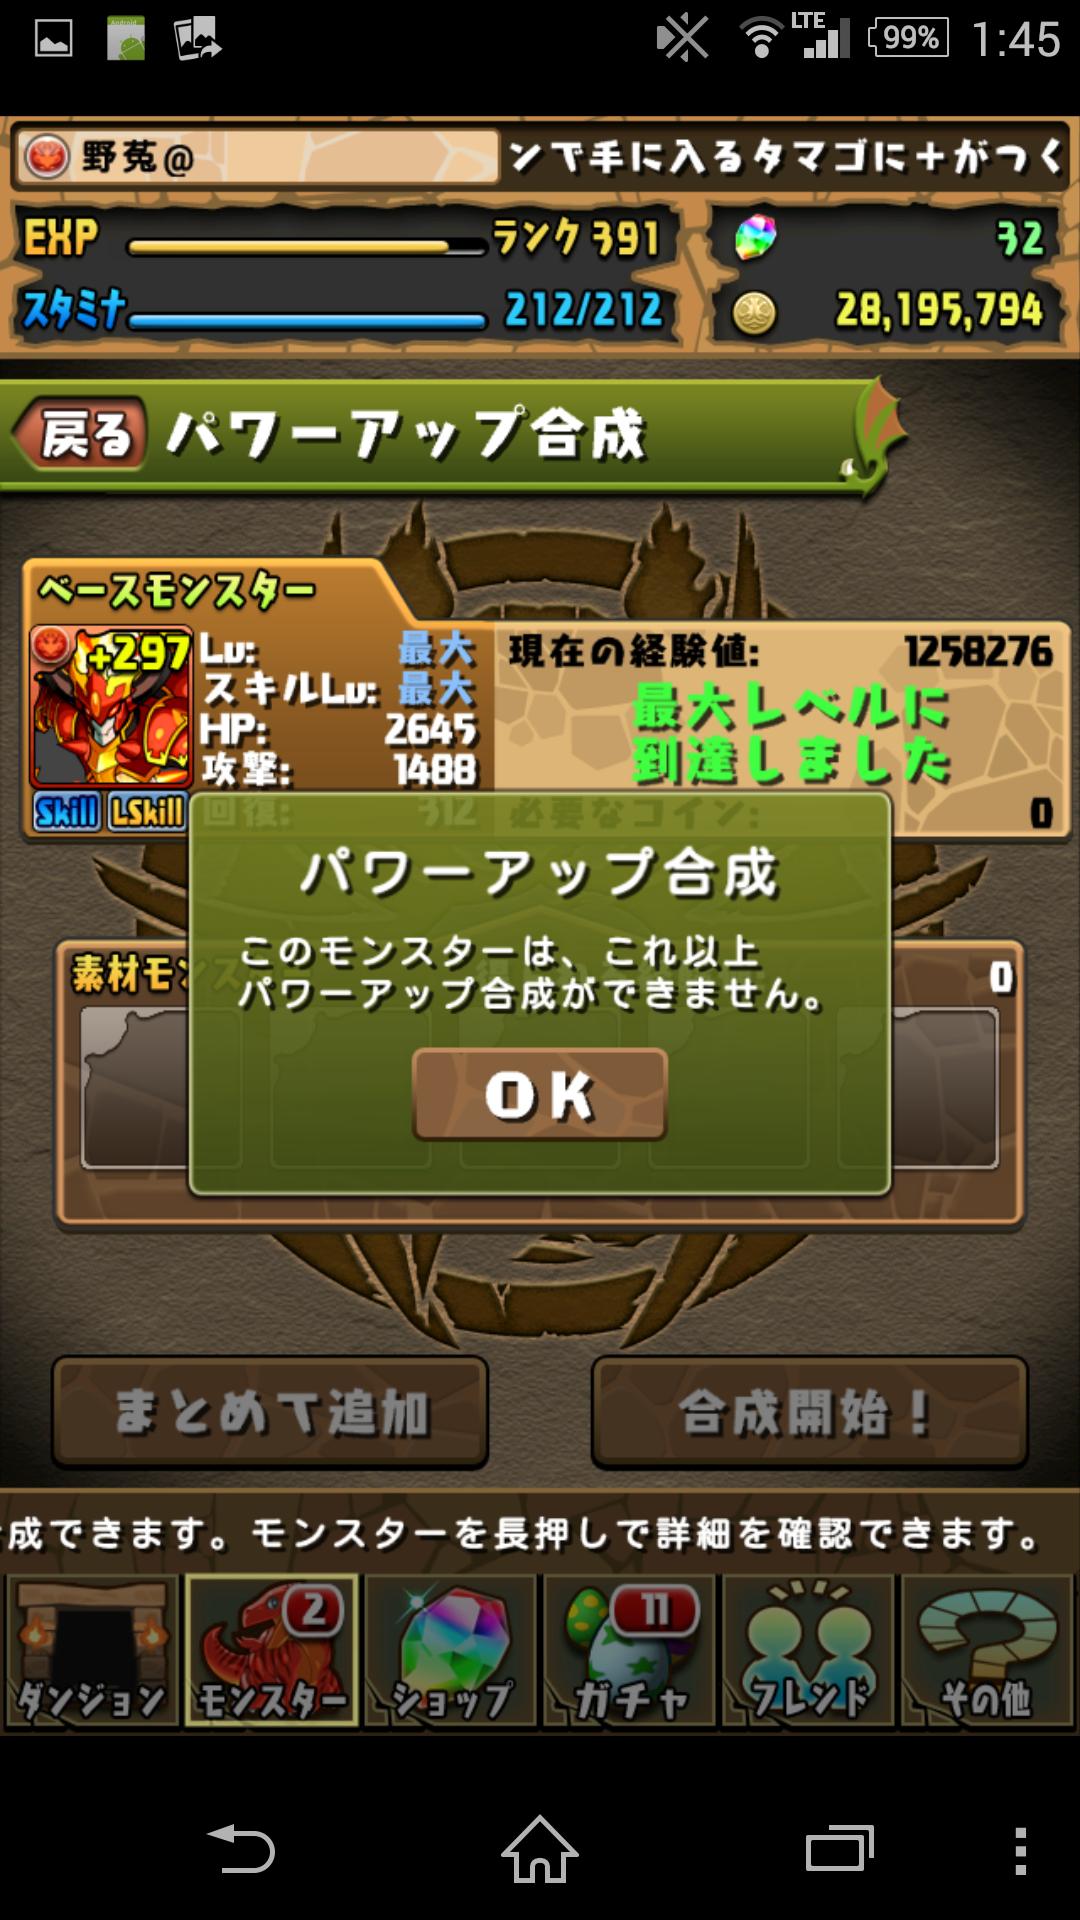 Screenshot_2014-10-24-01-45-42.png